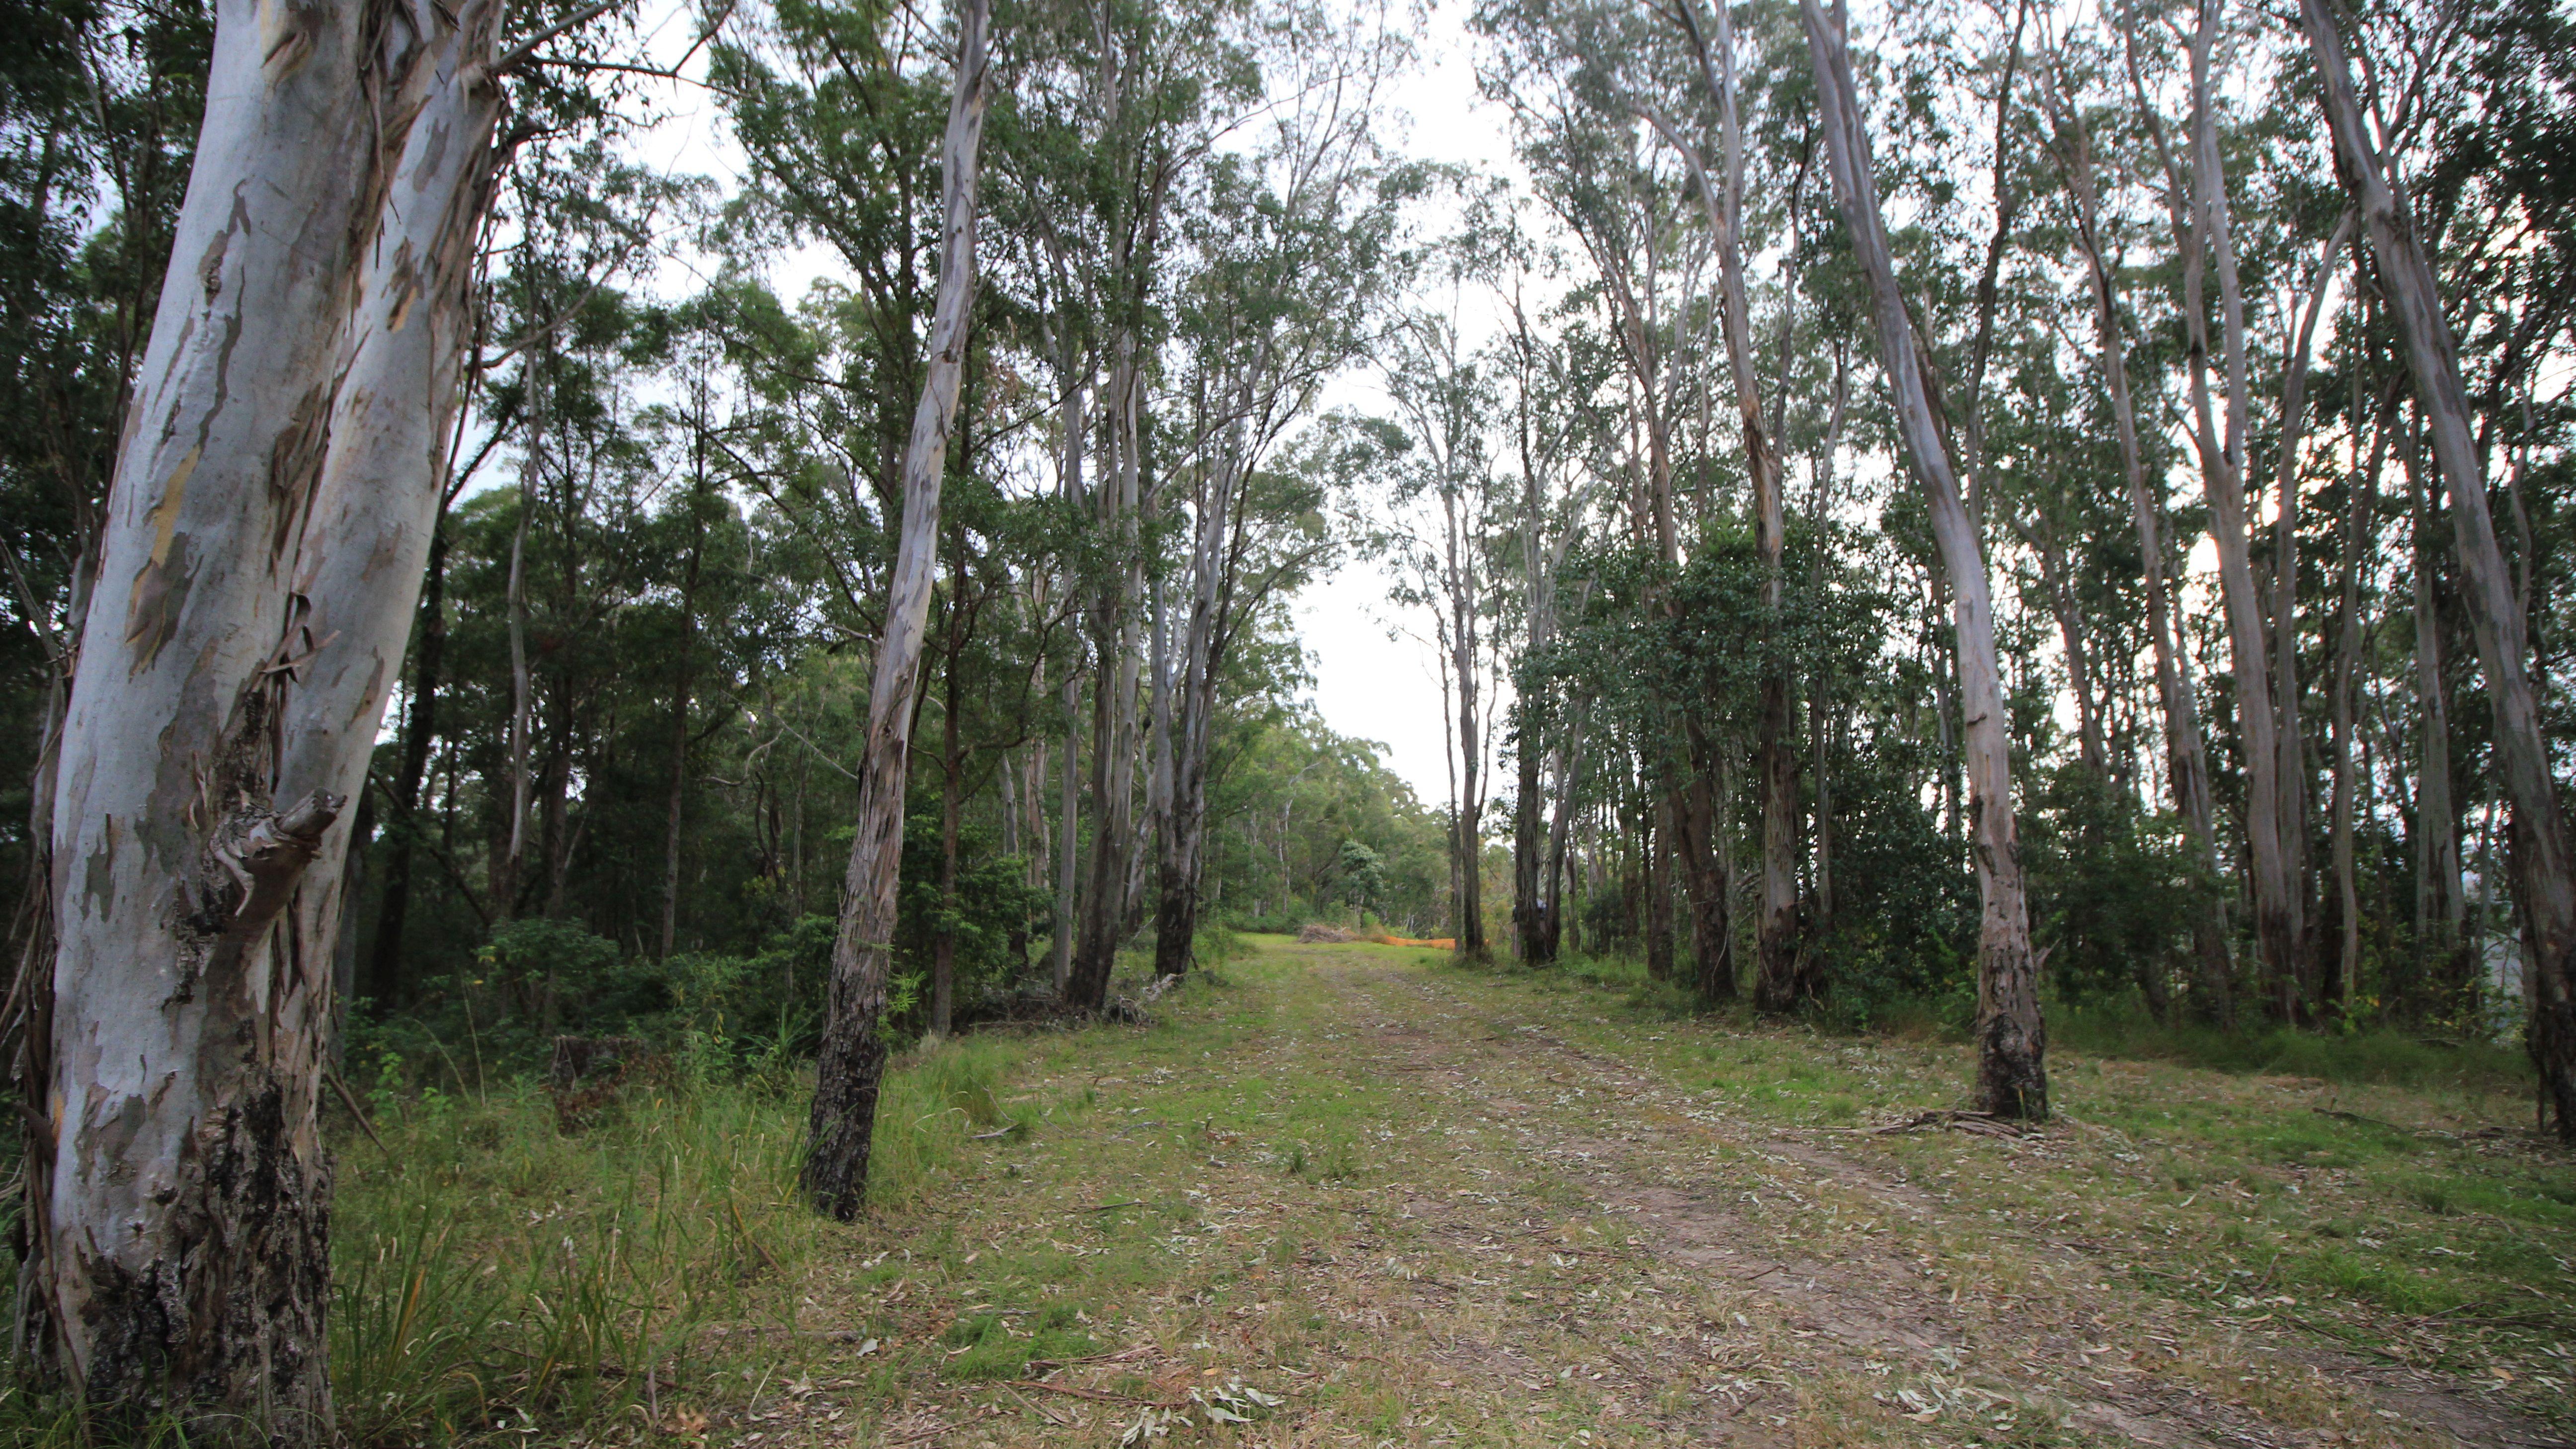 Lot 178 Lorne Rd, Batar Creek via, LORNE NSW 2439